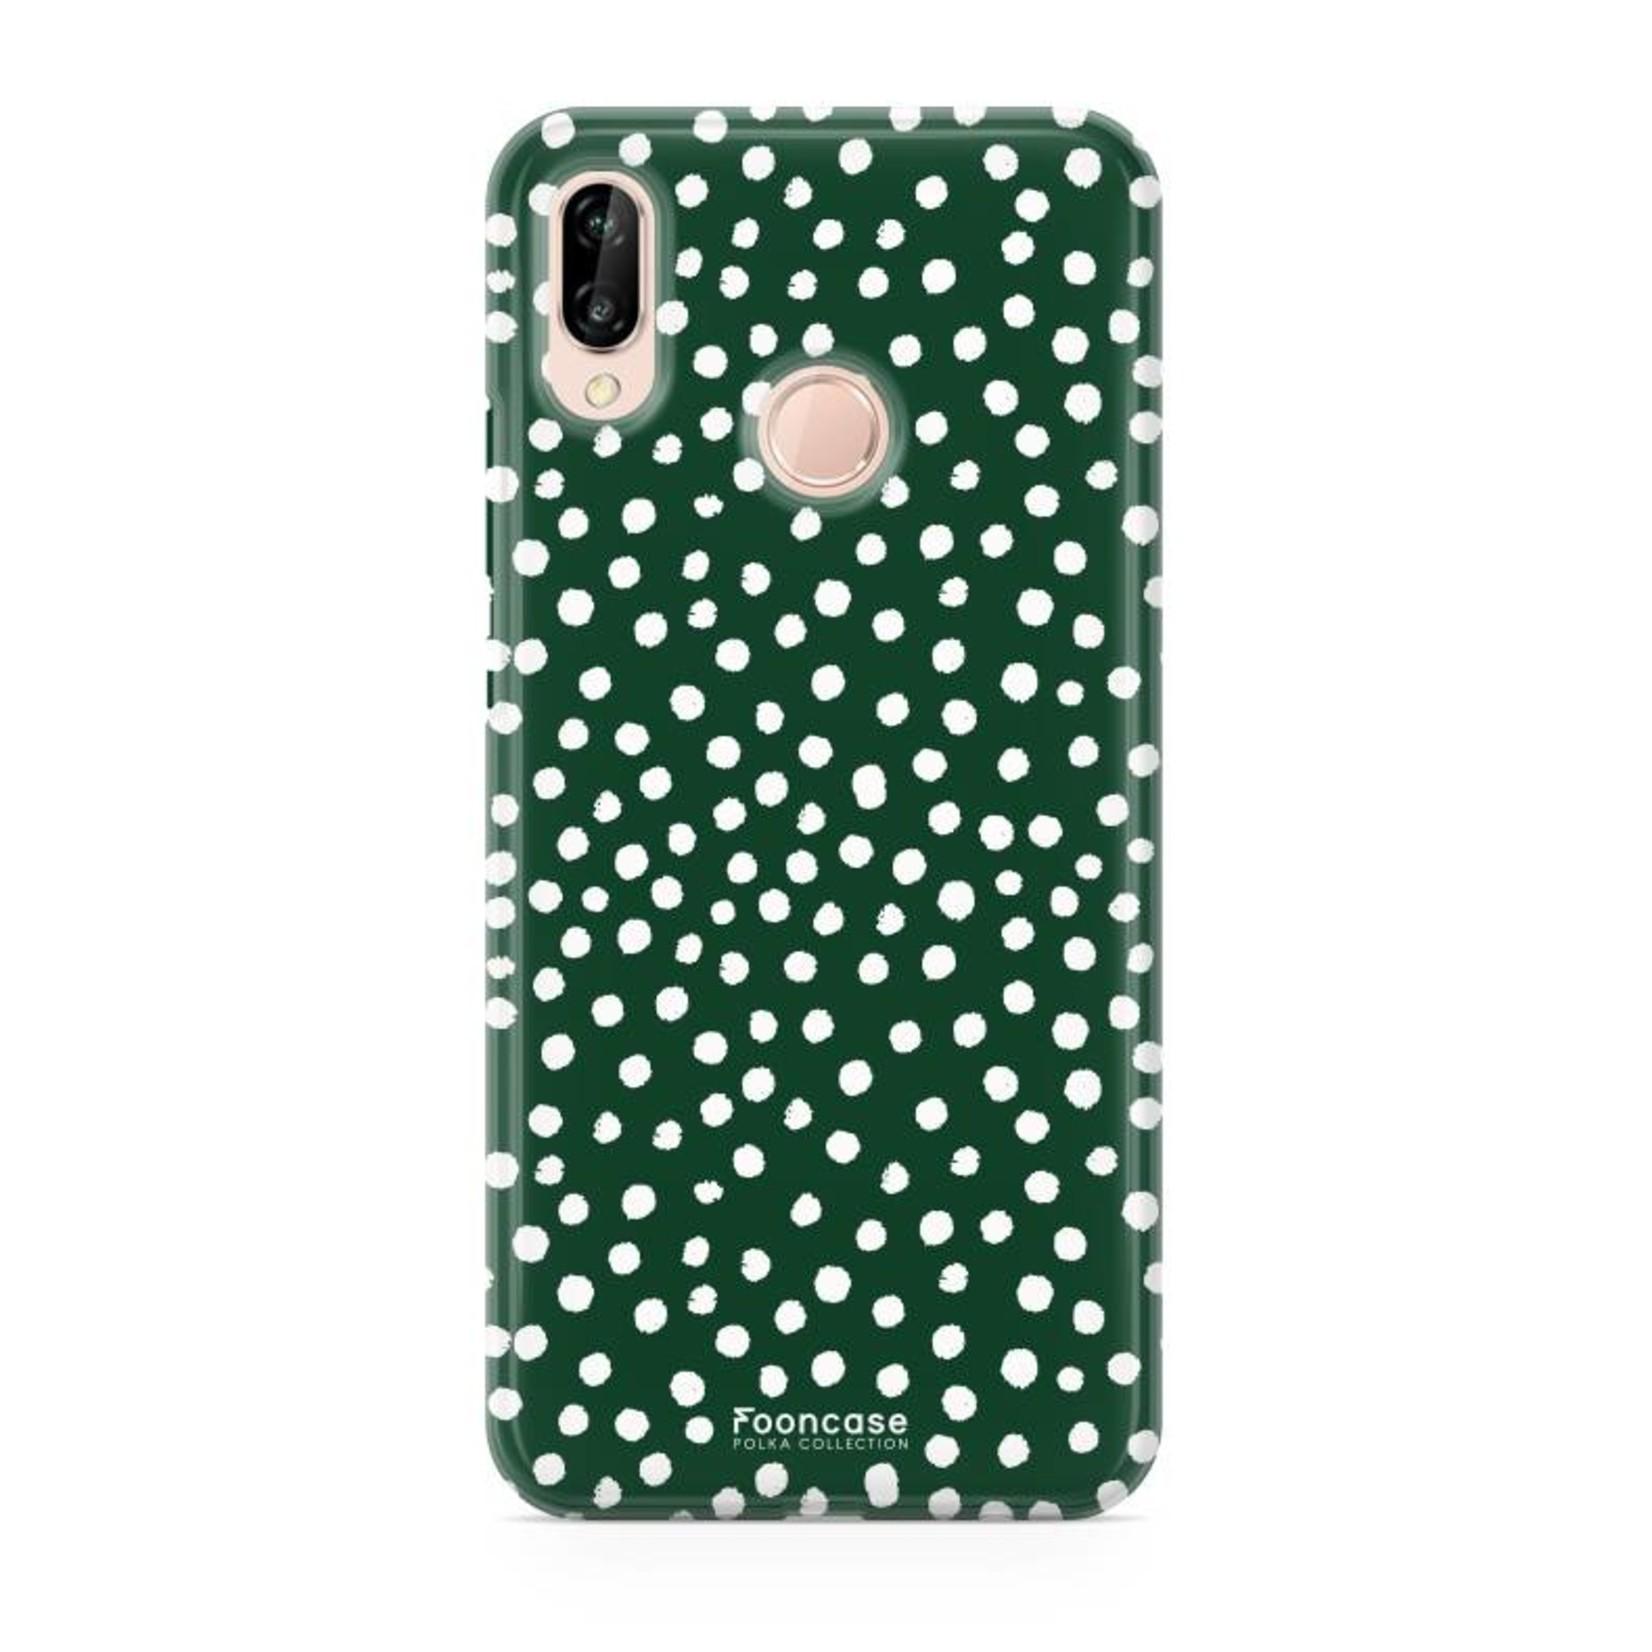 FOONCASE Huawei P20 Lite - POLKA COLLECTION / Grün